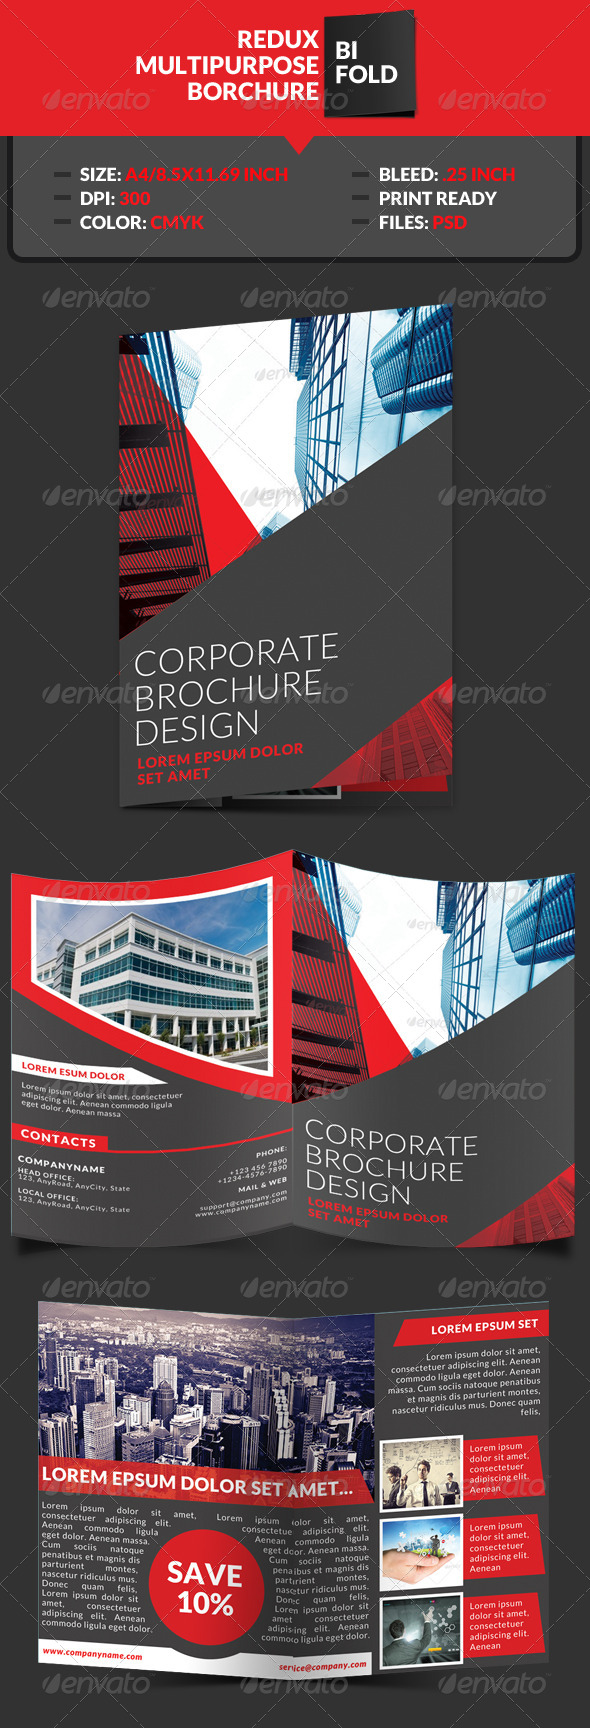 GraphicRiver Redux Corporate Bi-Fold Brochure Template 7745432